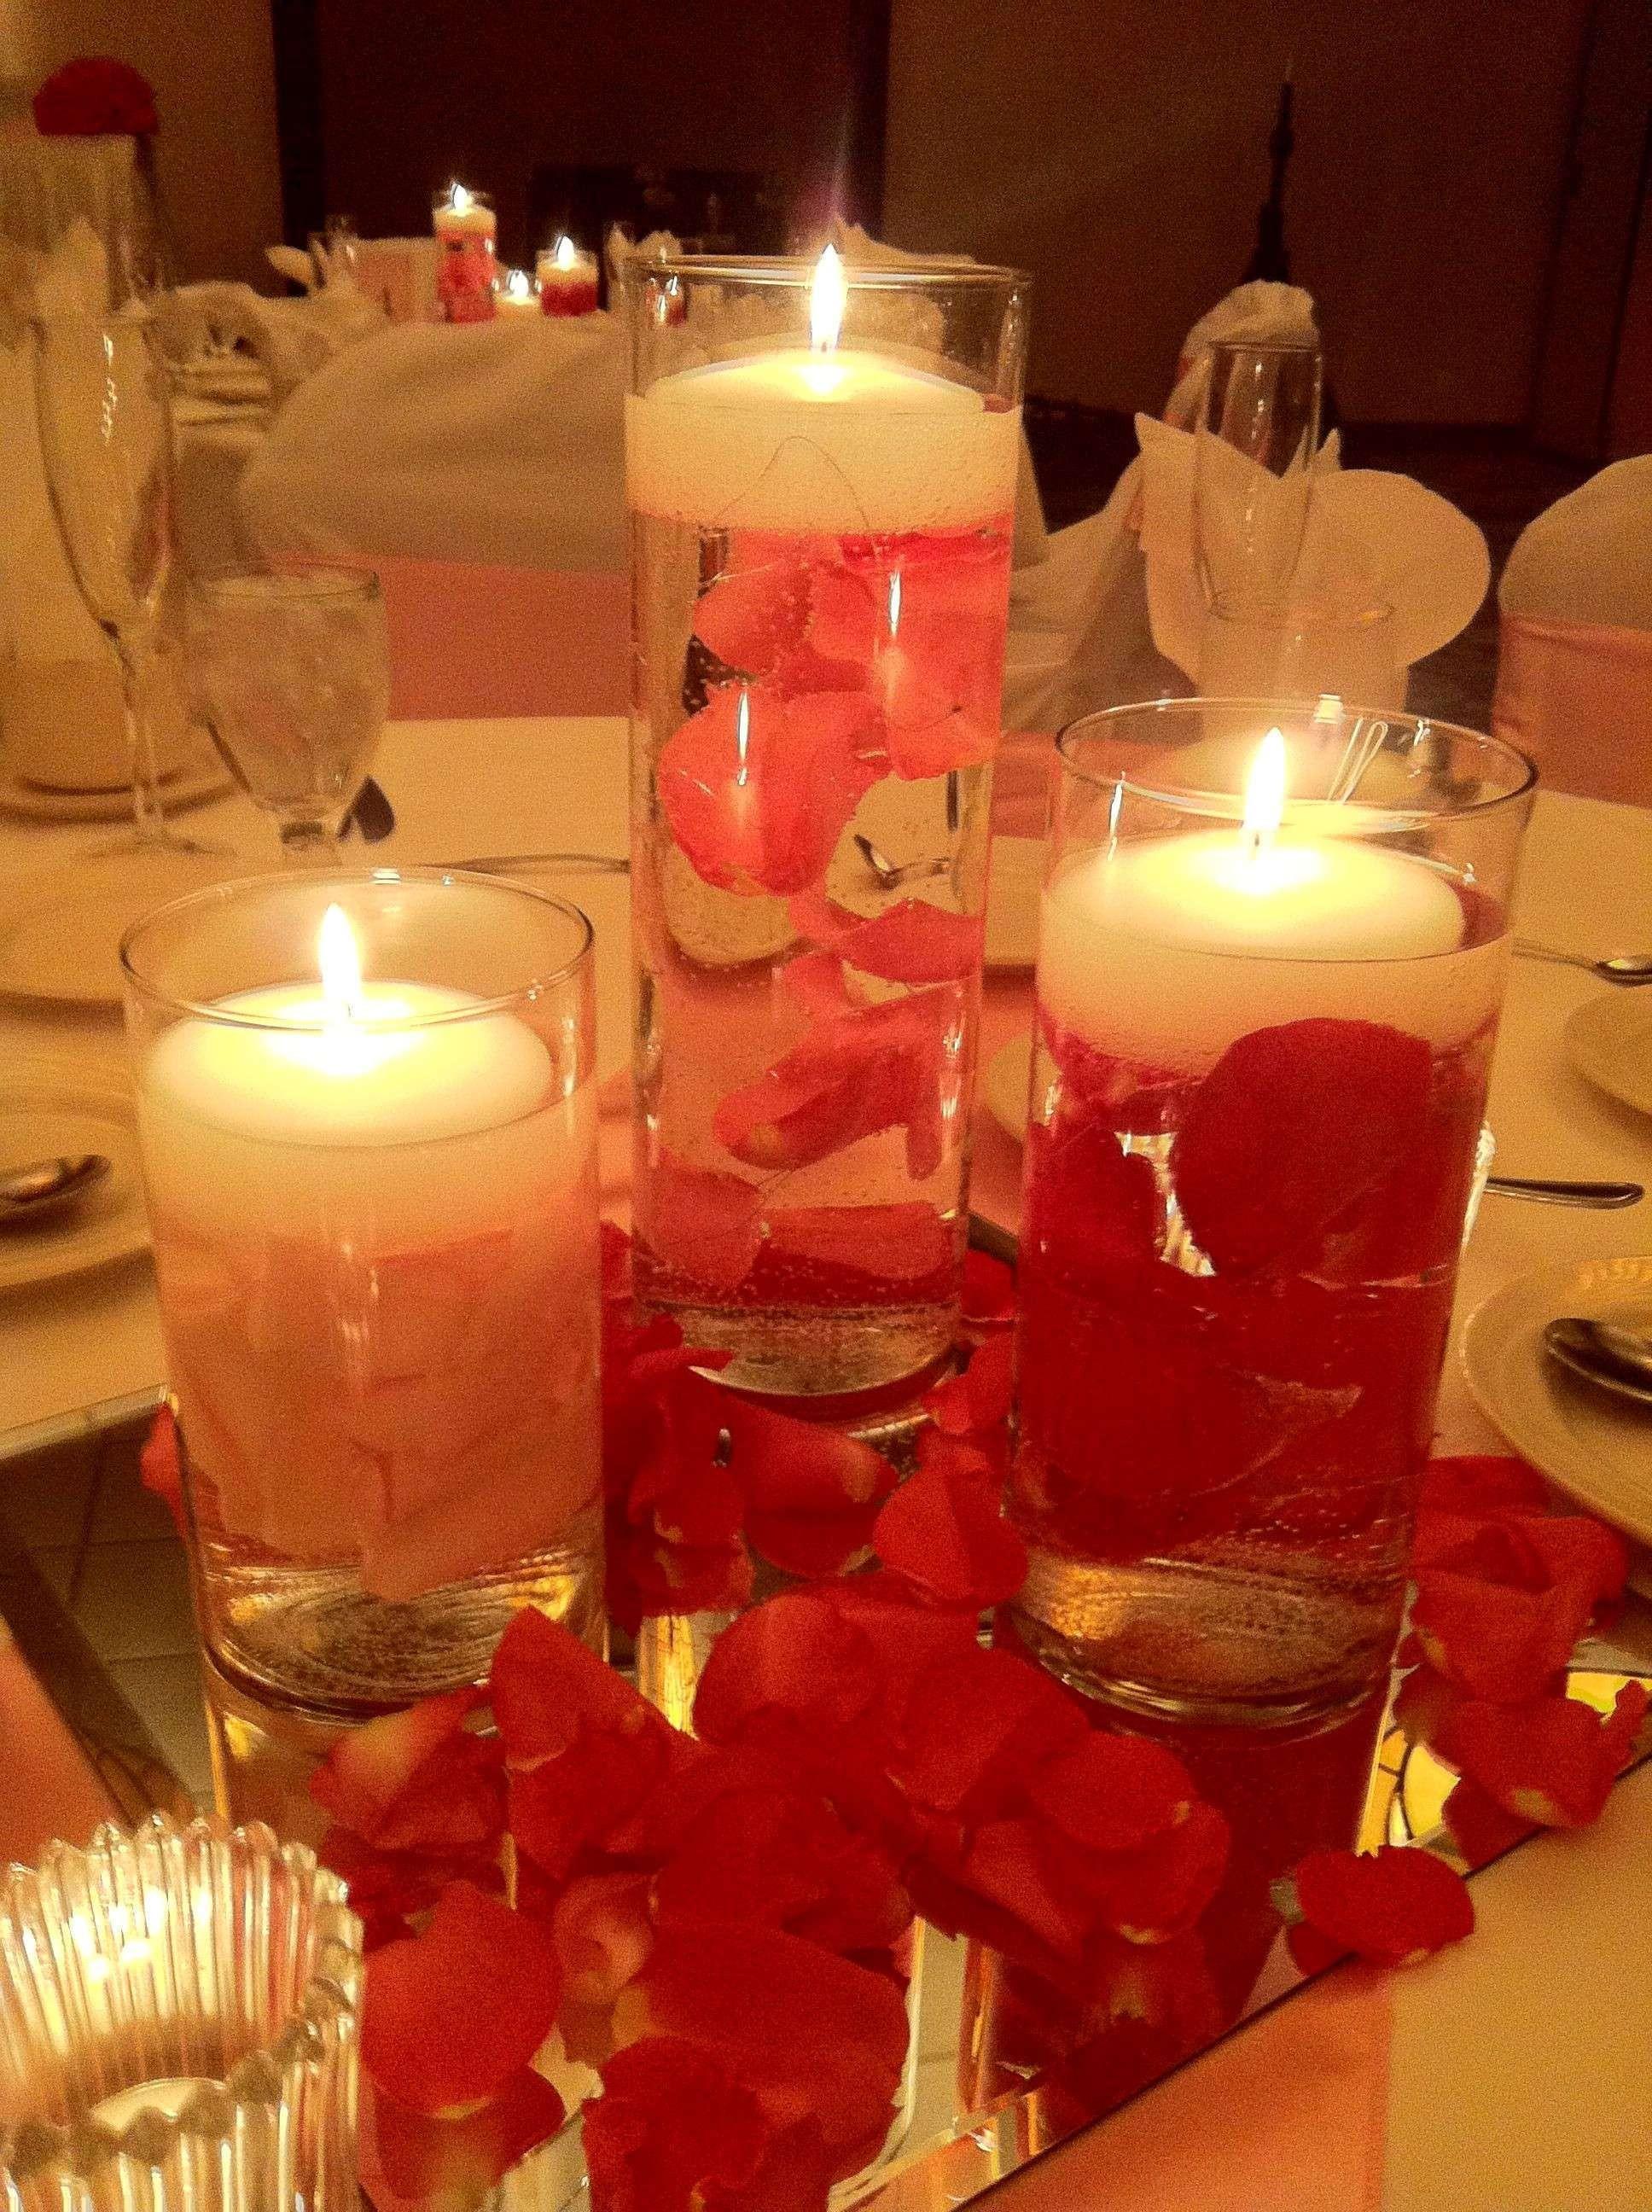 tiffany bud vase of wedding reception table decoration ideas unique easy wedding throughout wedding reception table decoration ideas unique easy wedding decorations new i pinimg originals 0d 55 ee